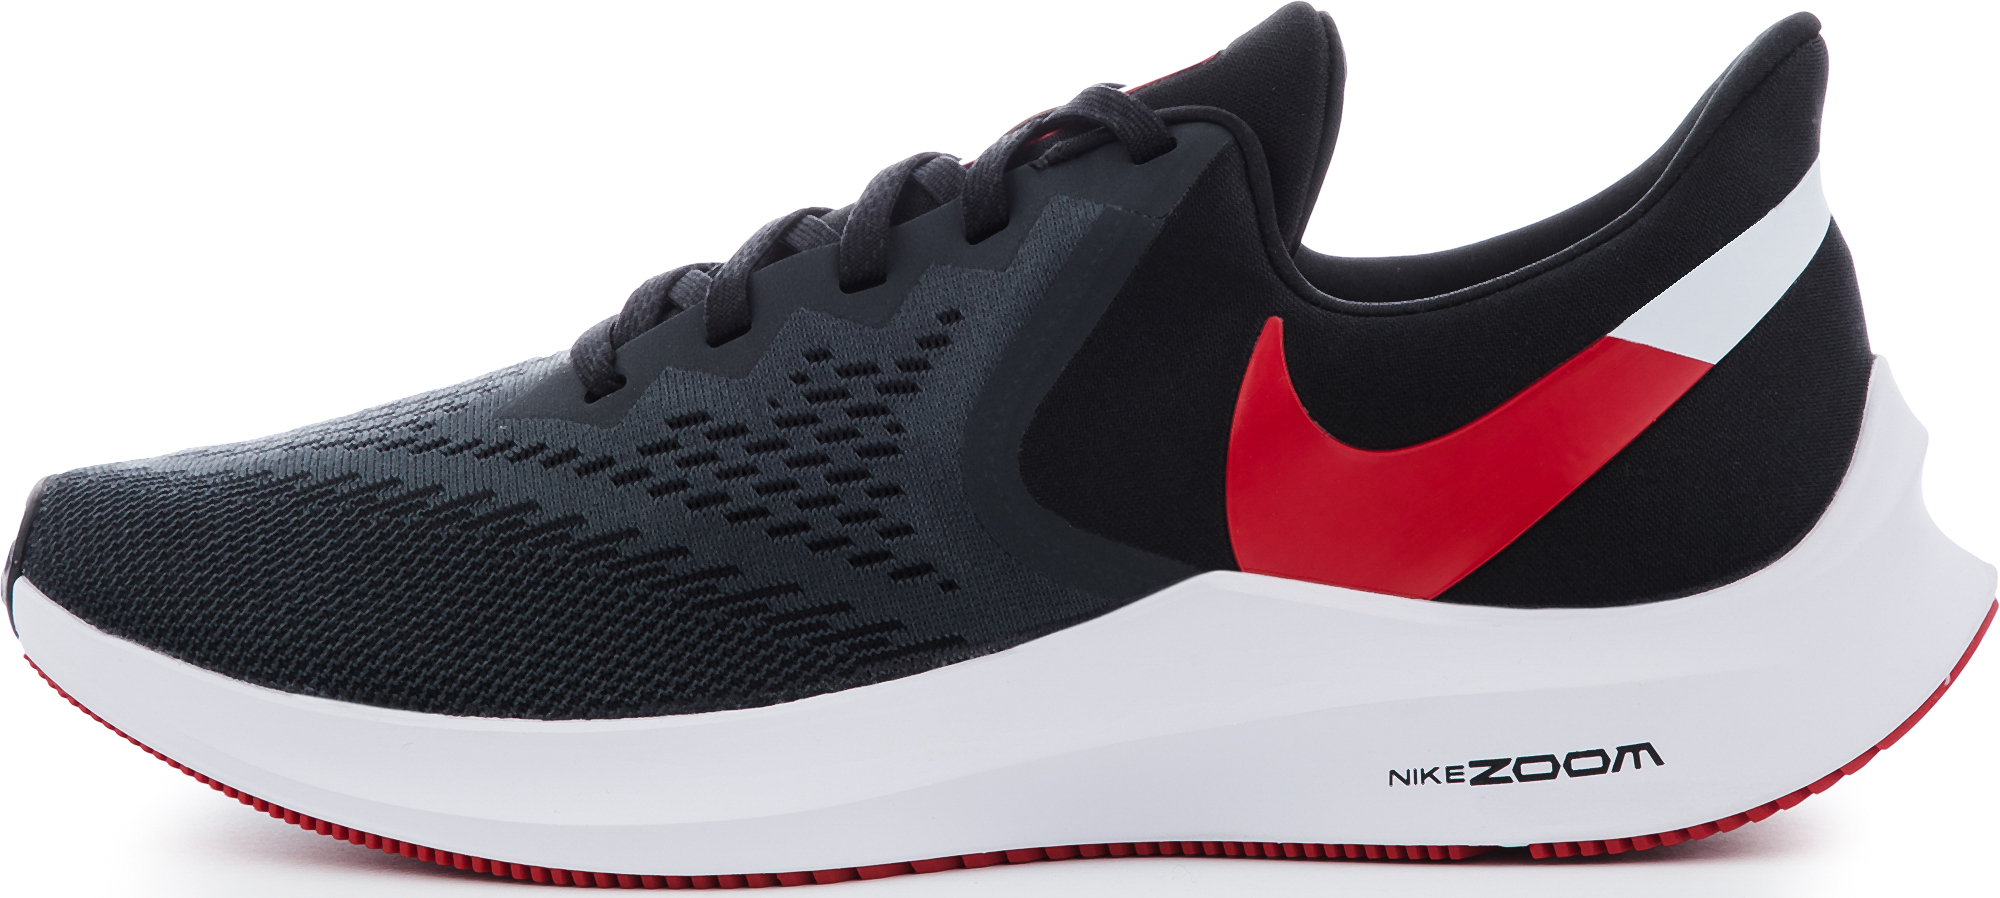 Nike Кроссовки мужские Zoom Winflo 6, размер 43,5